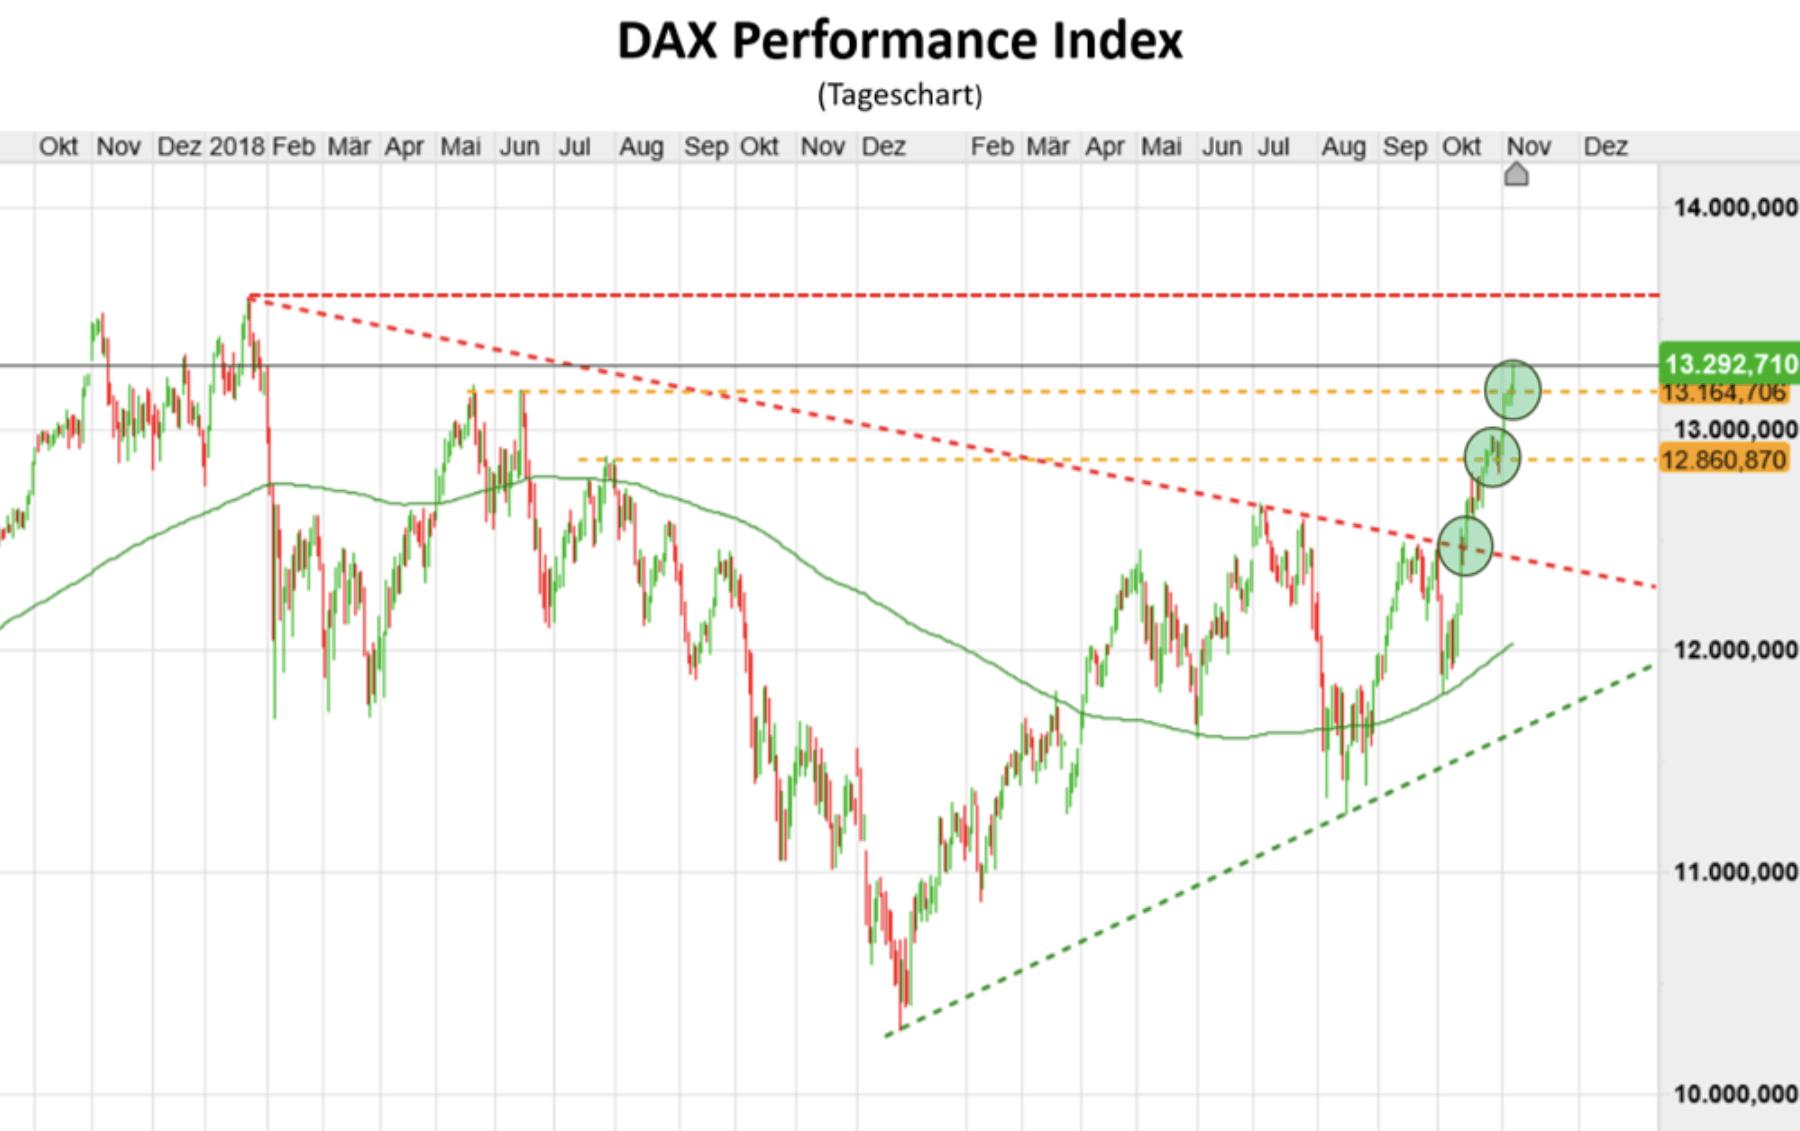 Performance Index